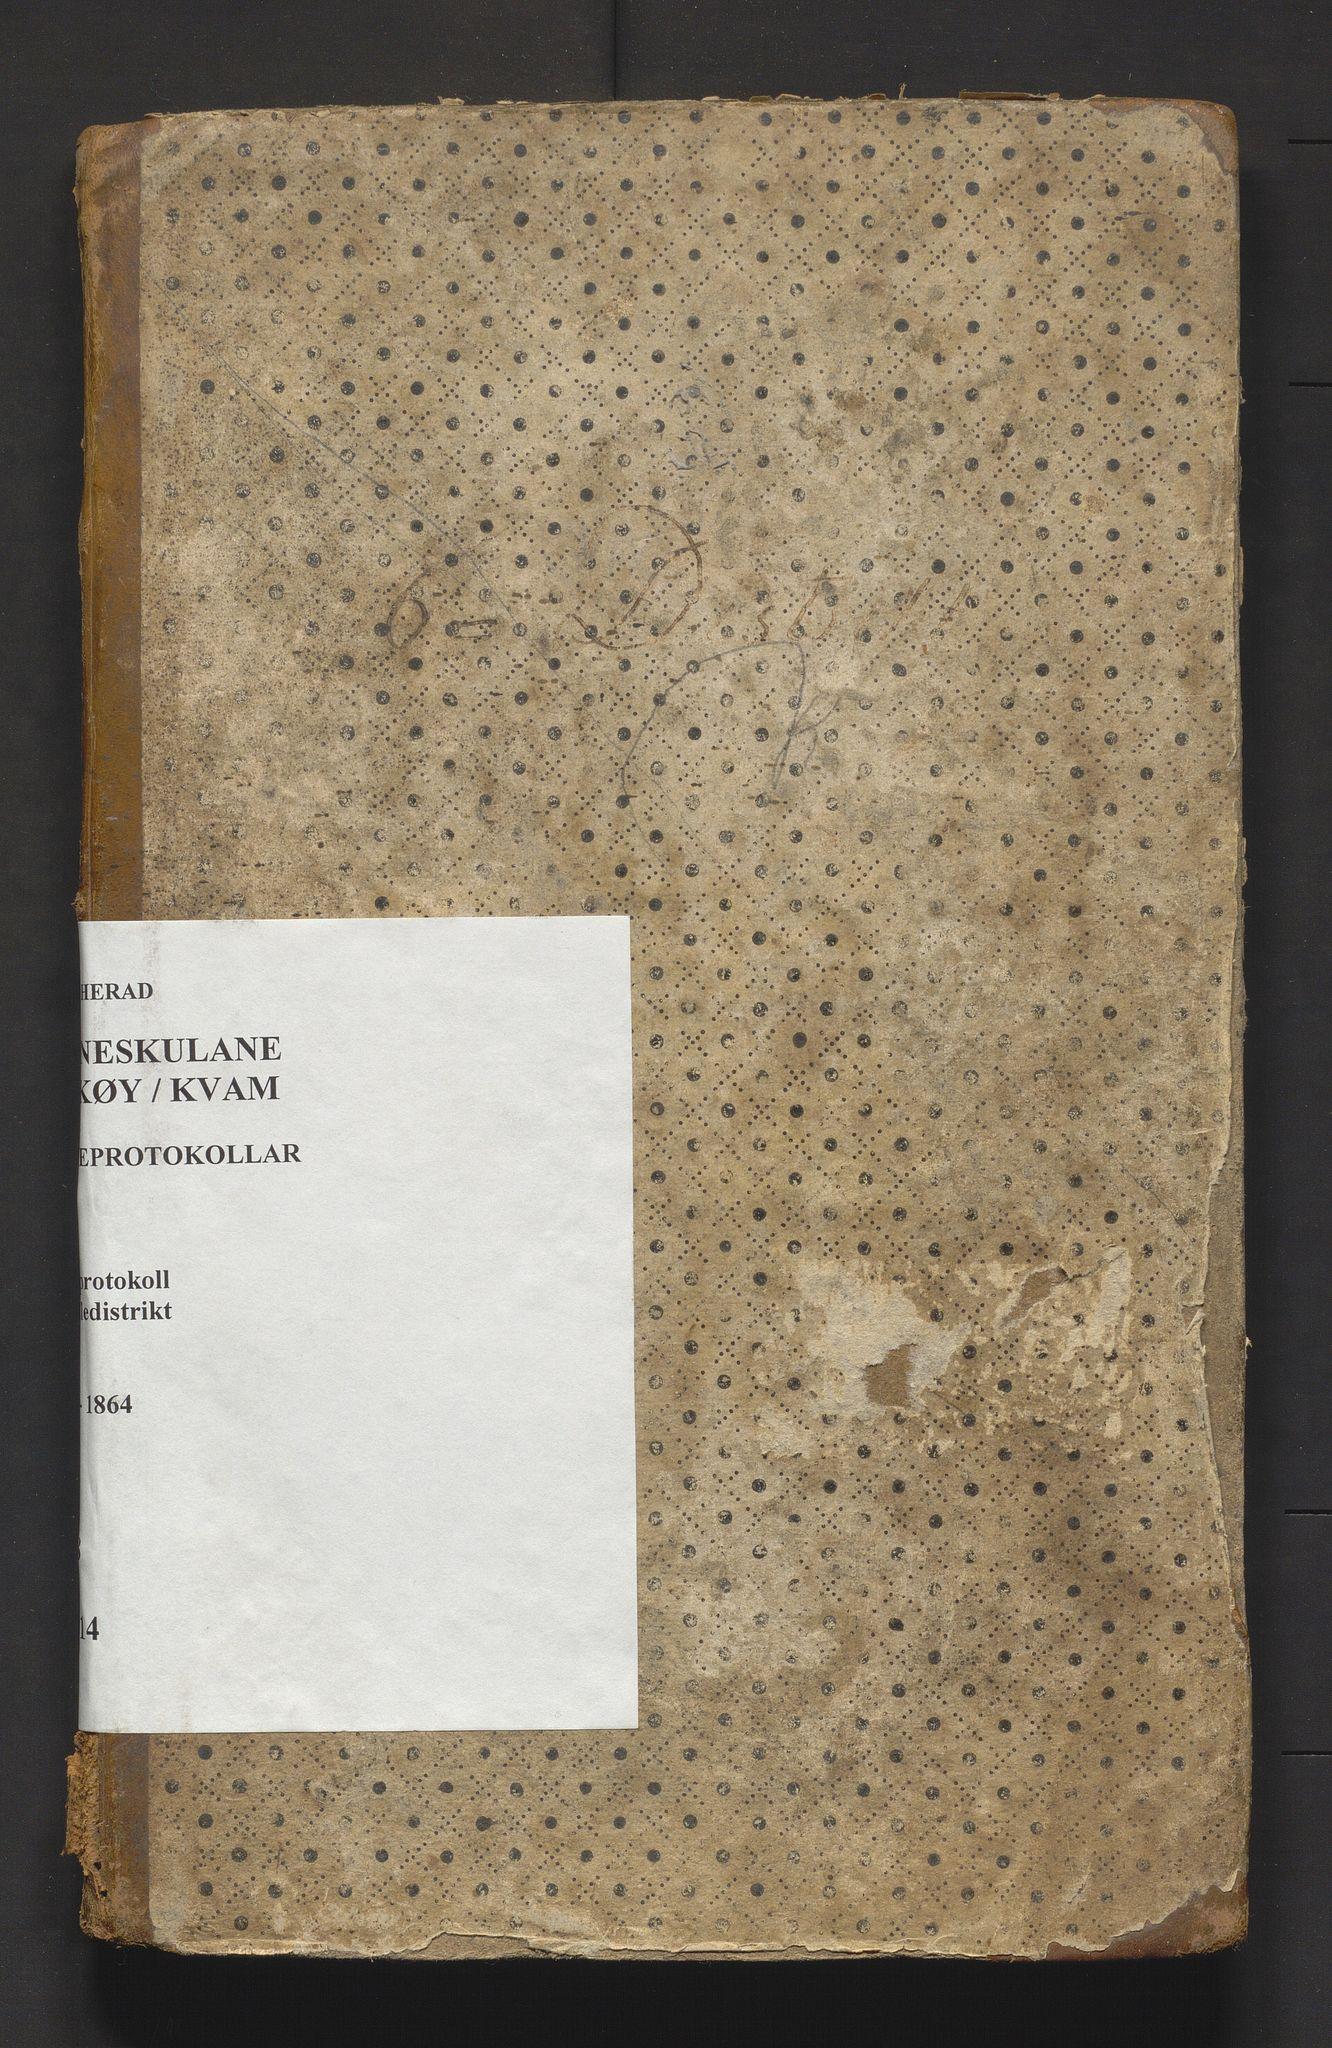 IKAH, Kvam herad. Barneskulane, F/Fa/L0014: Skuleprotokoll for skoleholderen i Vikøy prestegjeld 6. skuledistrikt m/ inventarliste, 1833-1864